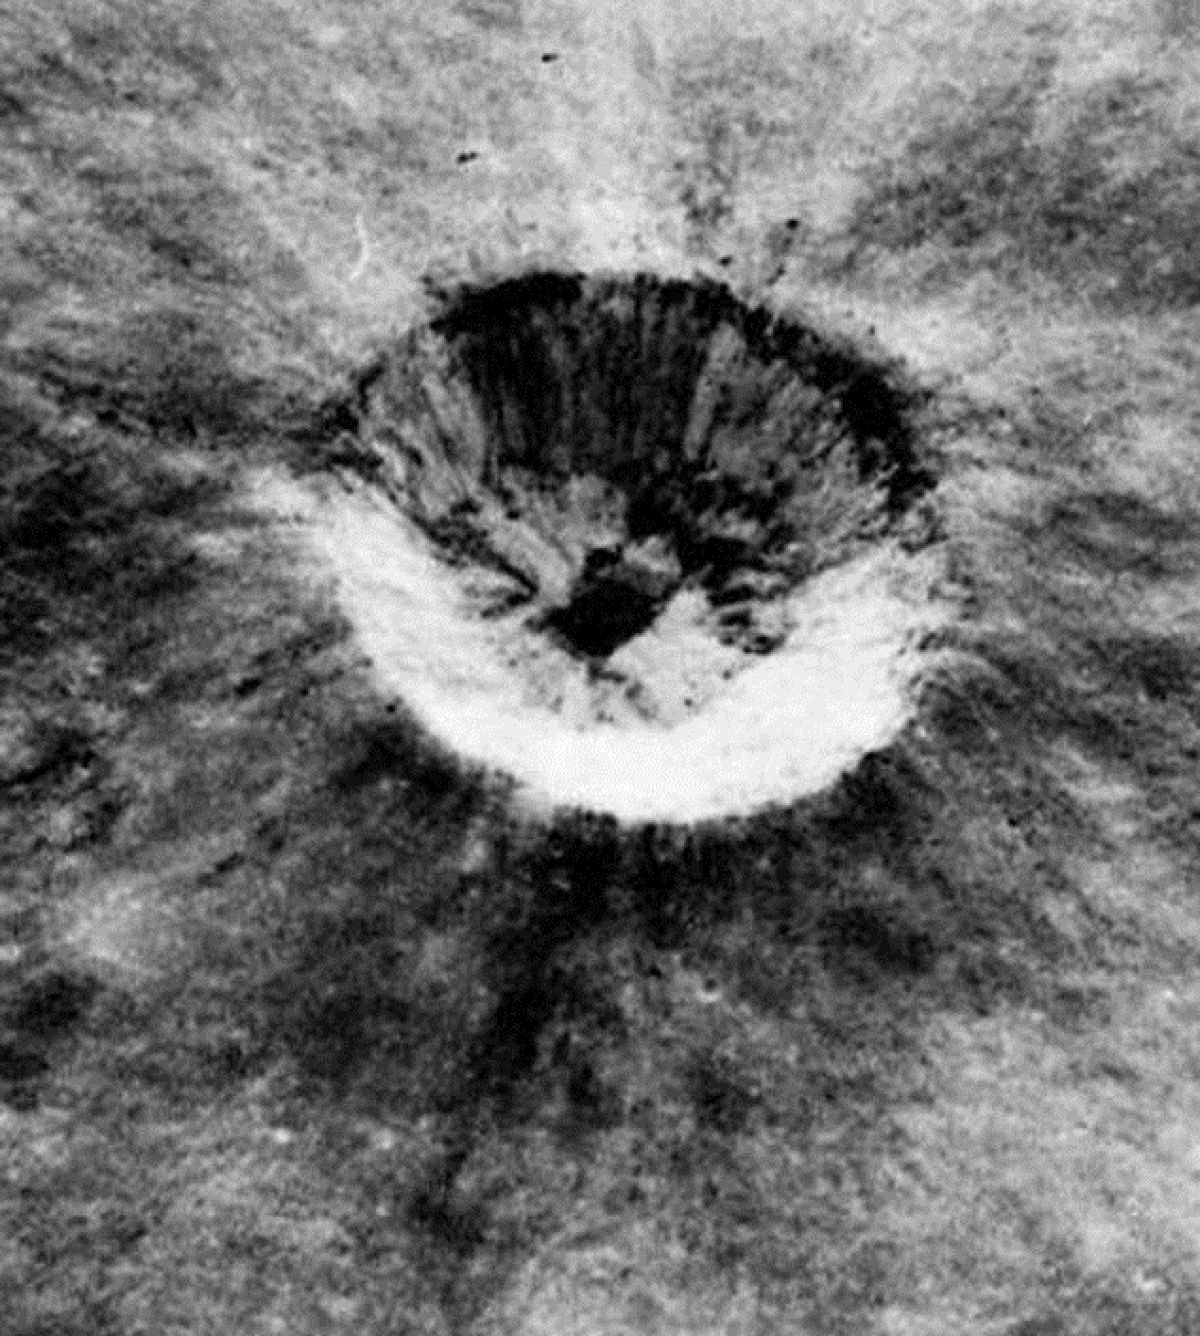 Шахта пришельцев на Луне – фотографии экипажа «Аполлона10»